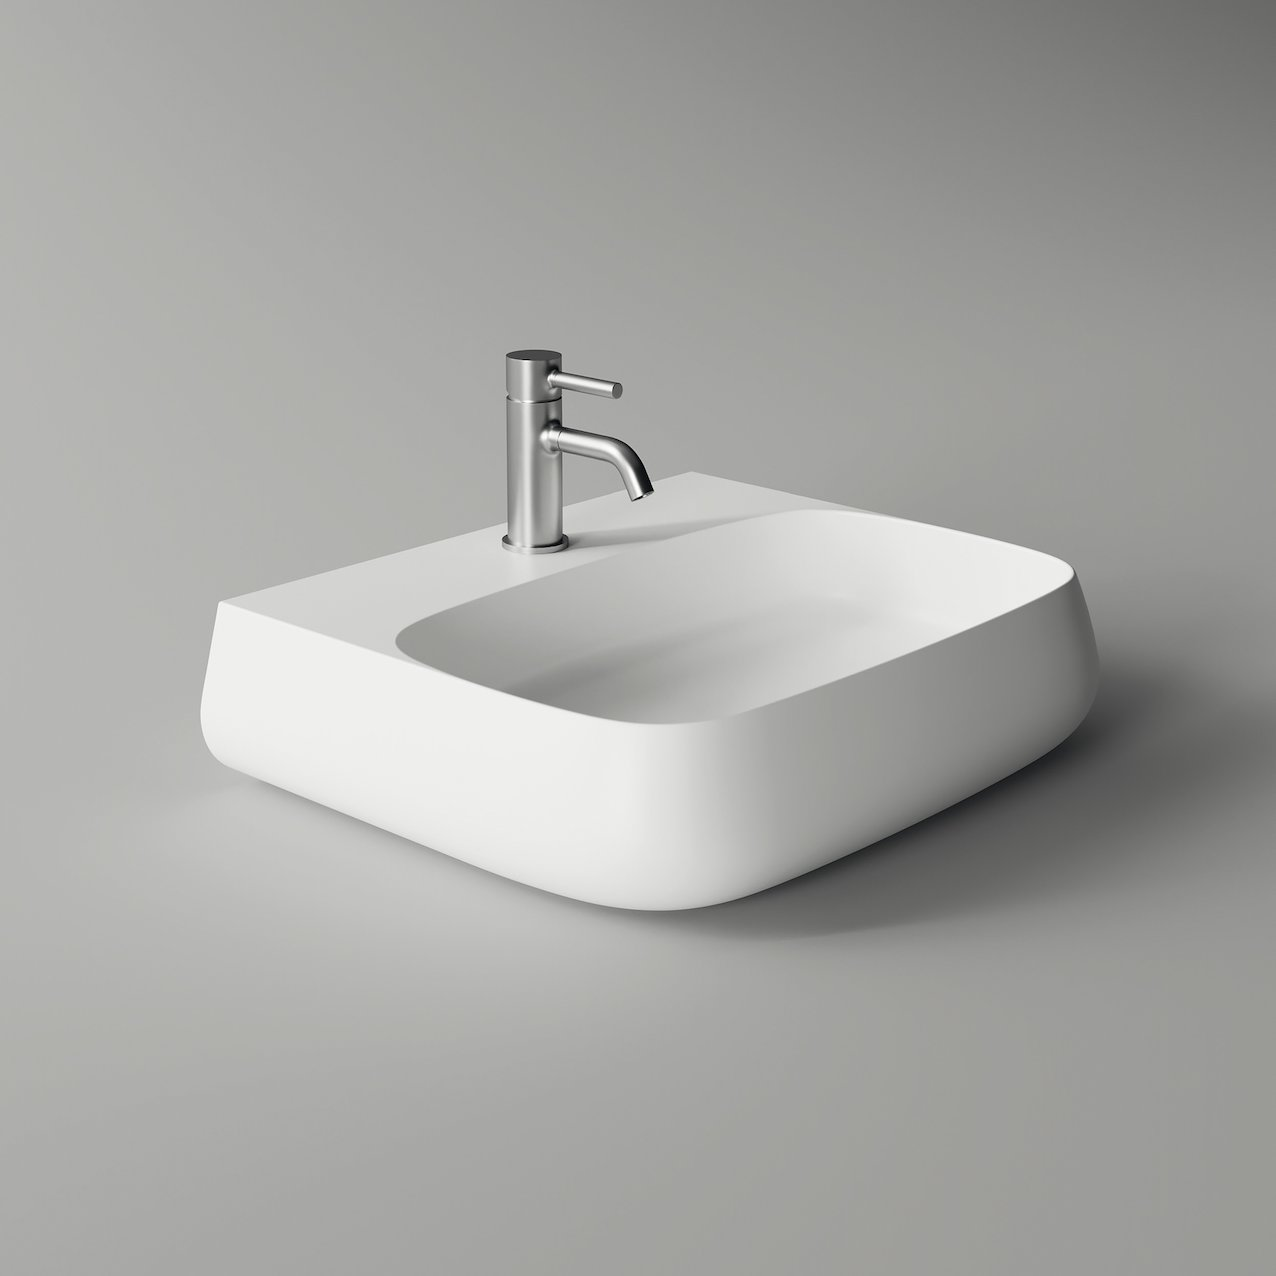 Lavabo NUR 55x45 cm